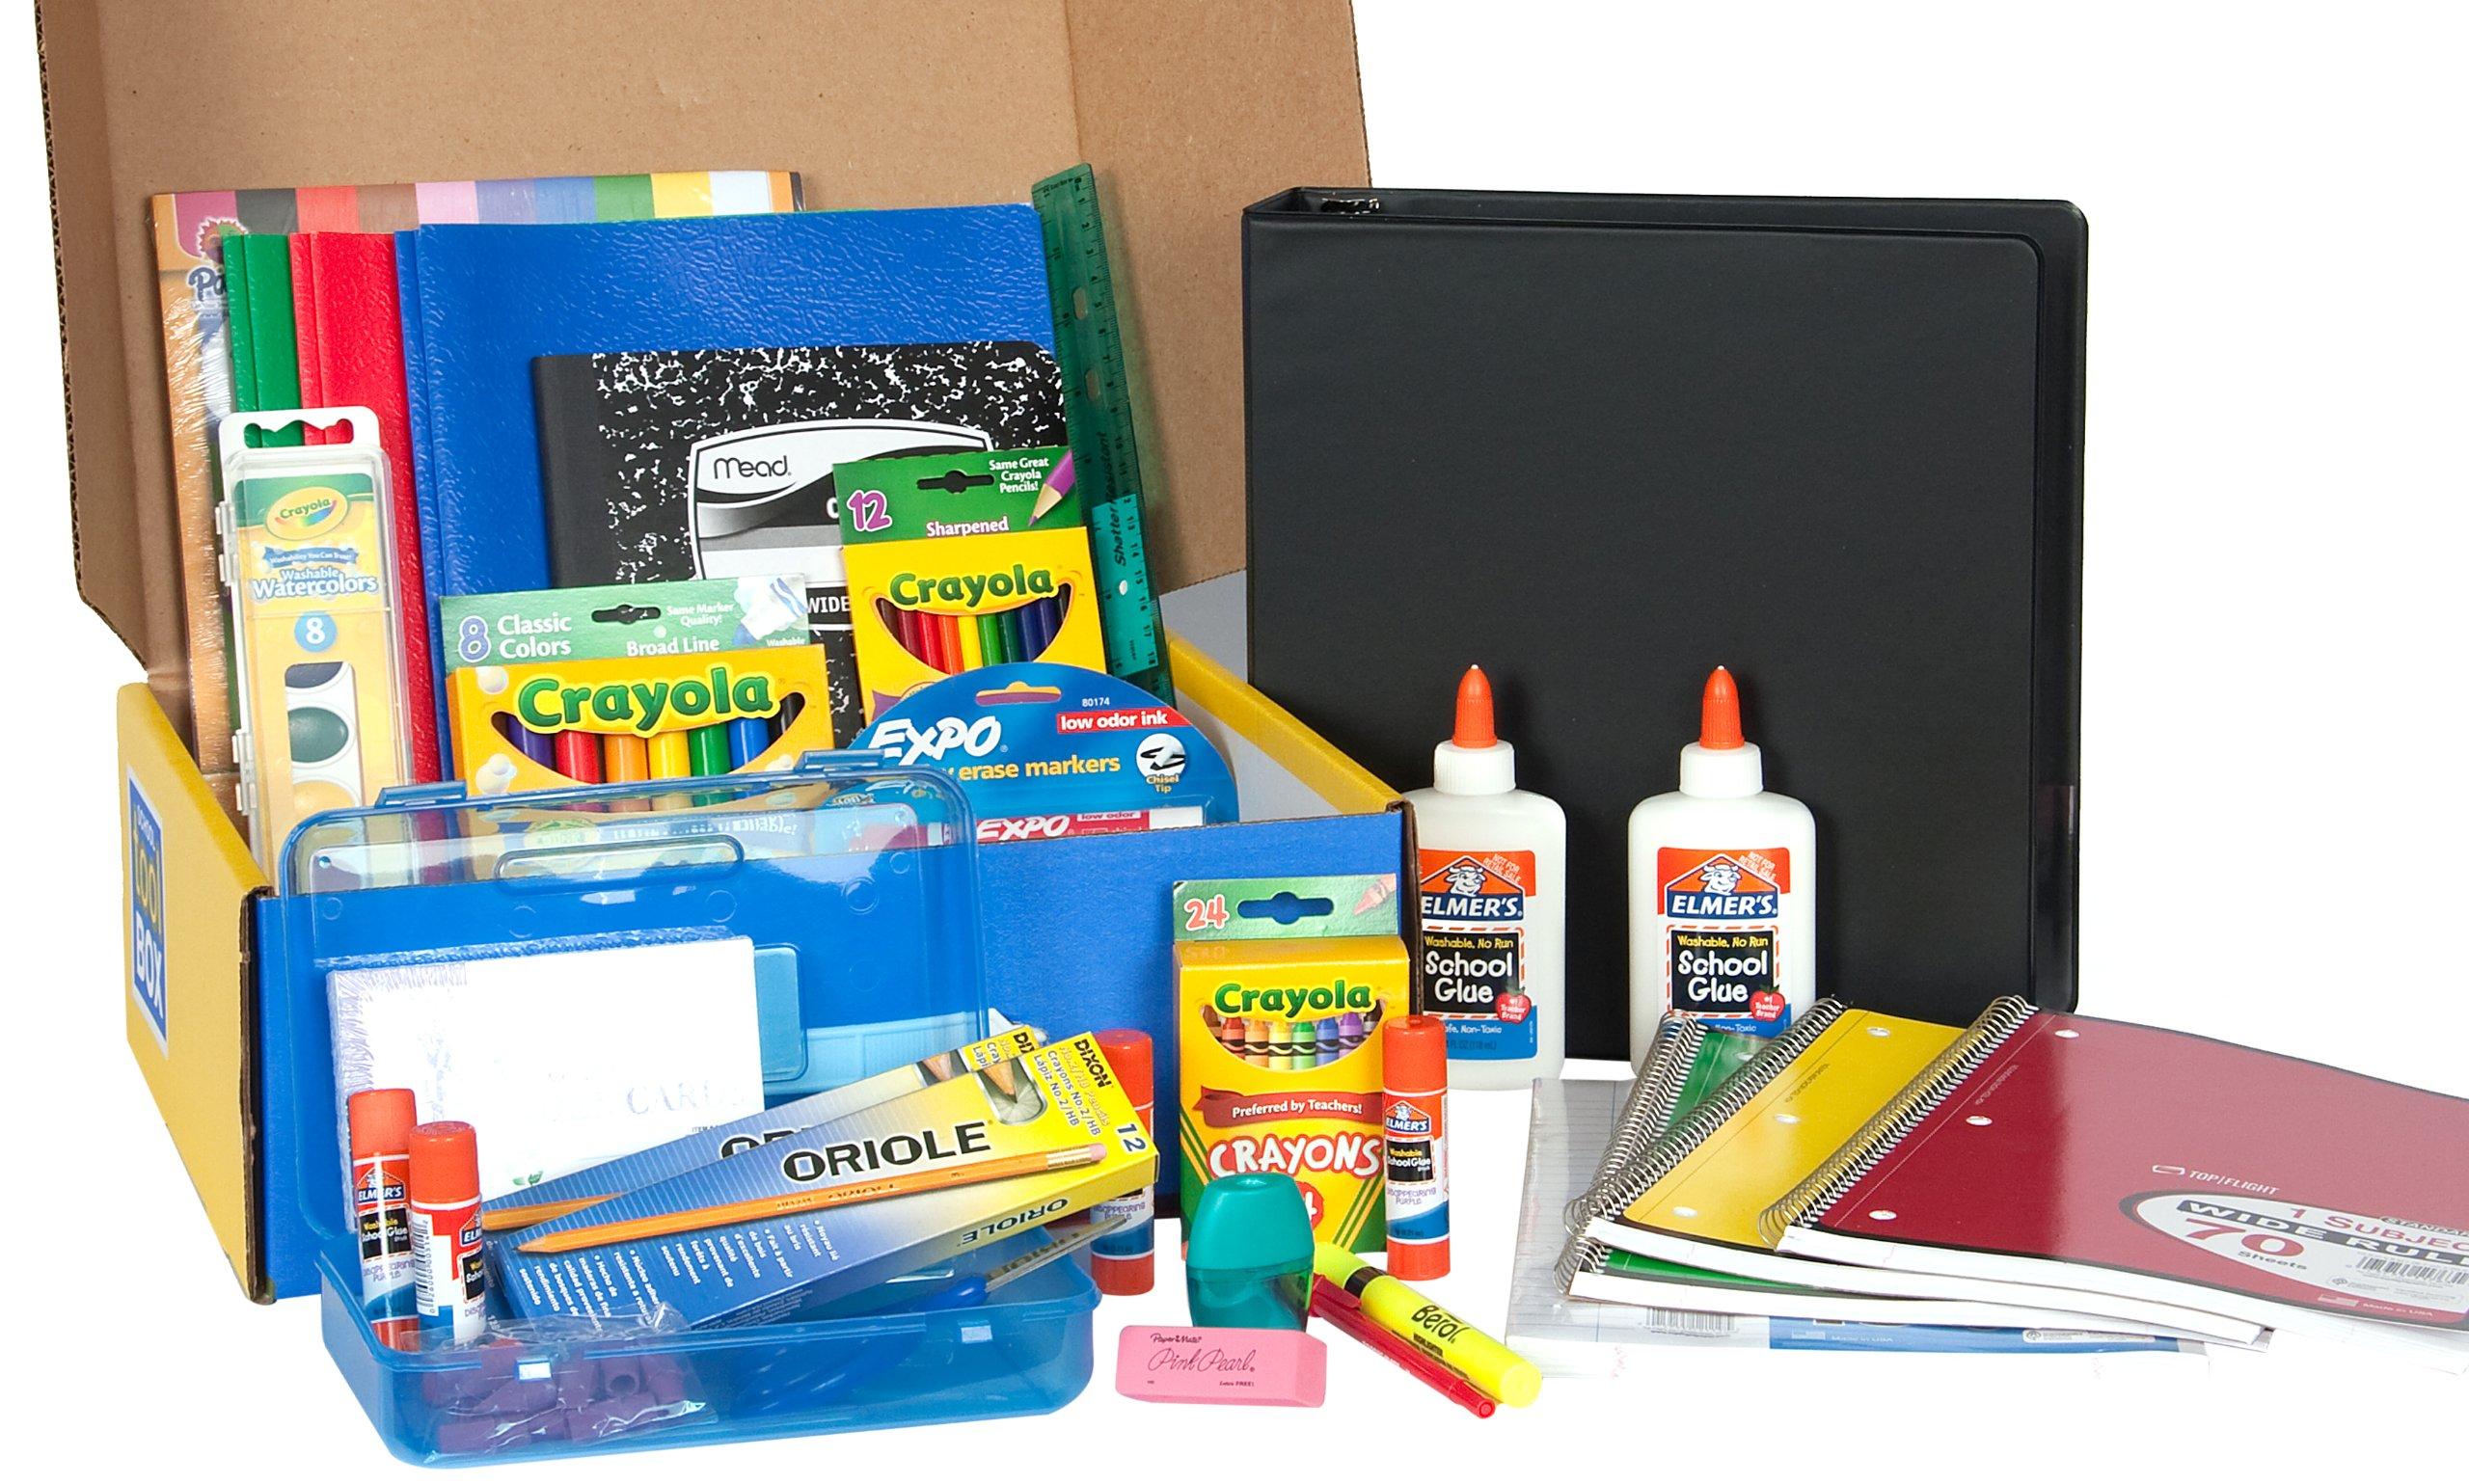 School Tool Box Second Grade Mega School Supplies Kit in Keepsake Box